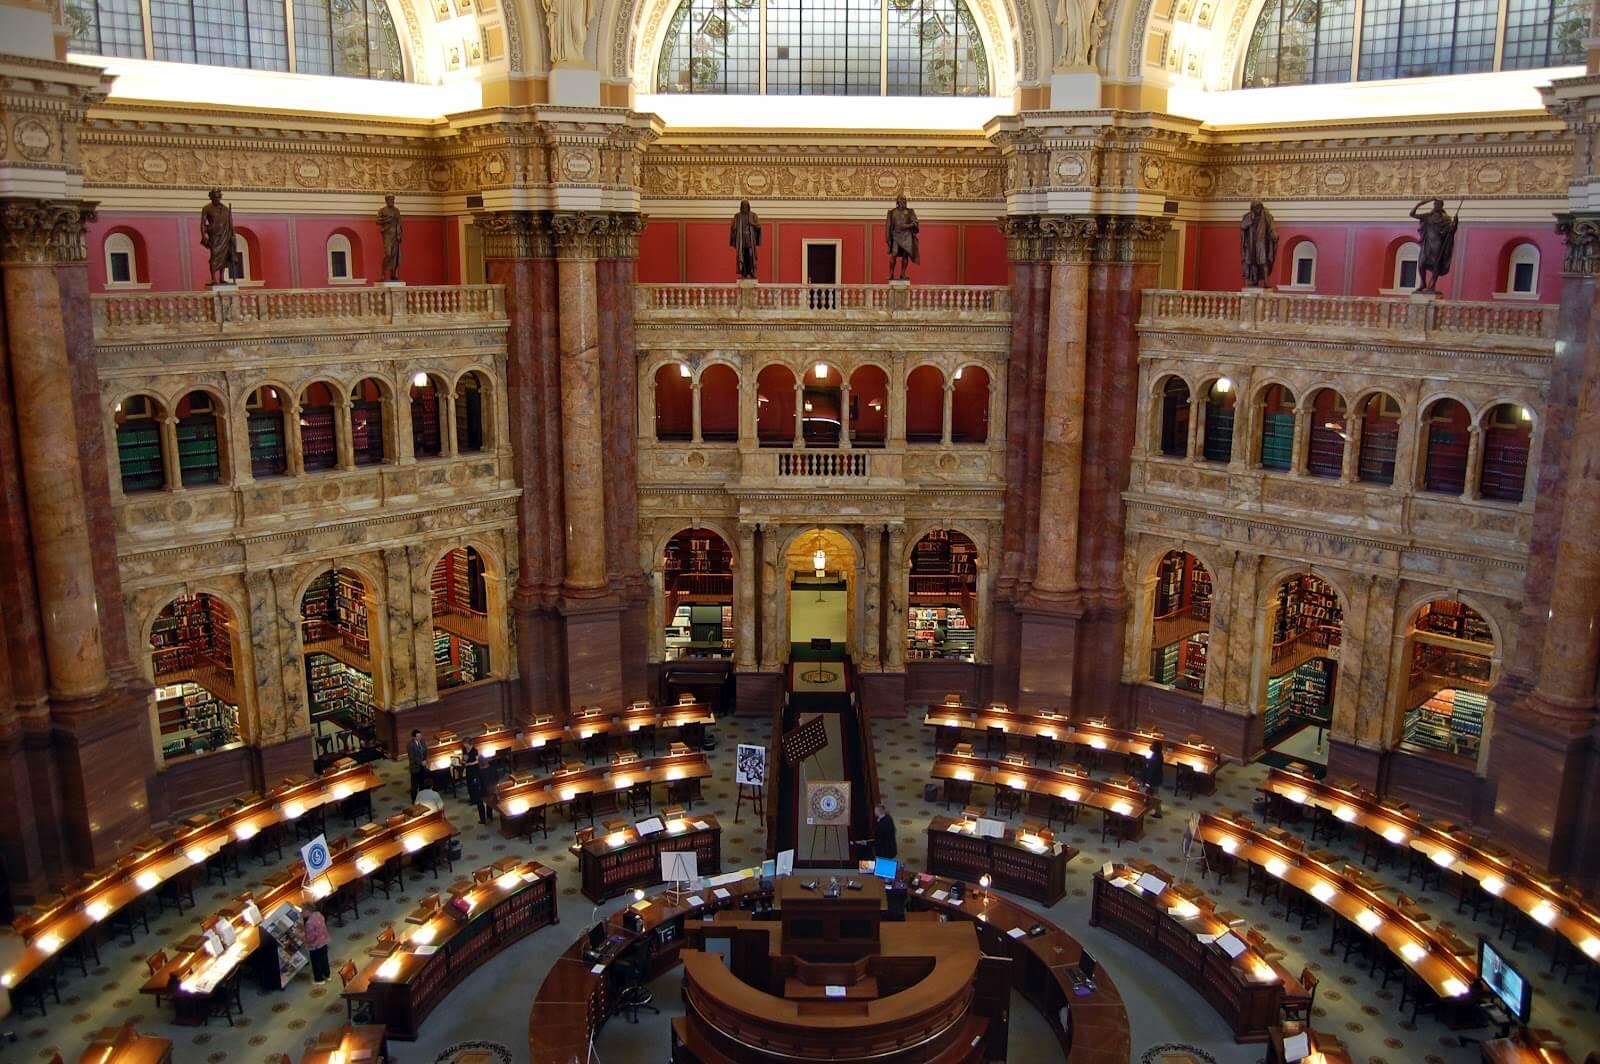 Library of Congress, Washington, DC, US